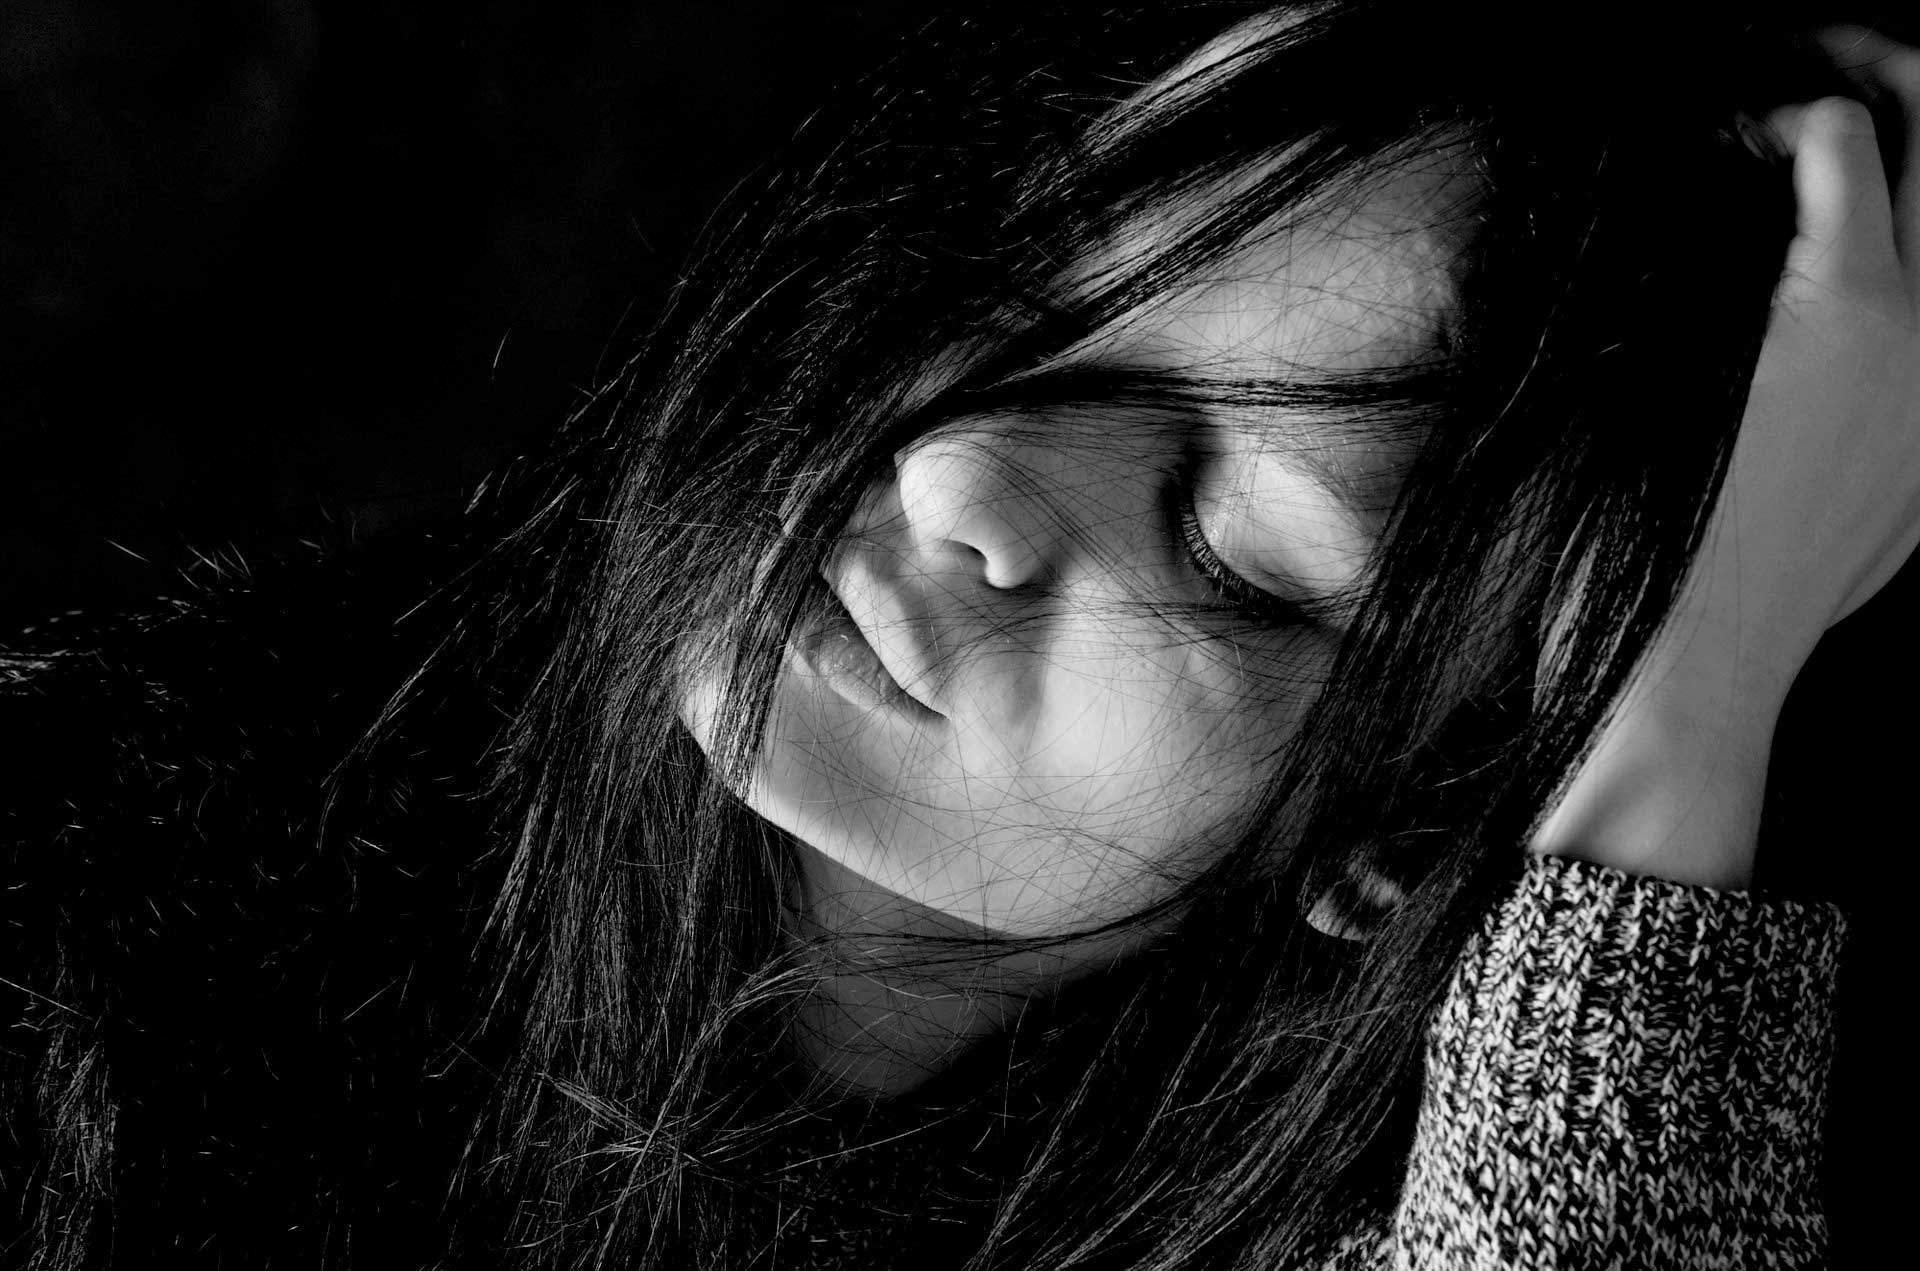 Alone And Sad Girl Hd Wallpaper Sad Girl Wallpapers Wallpaper Cave